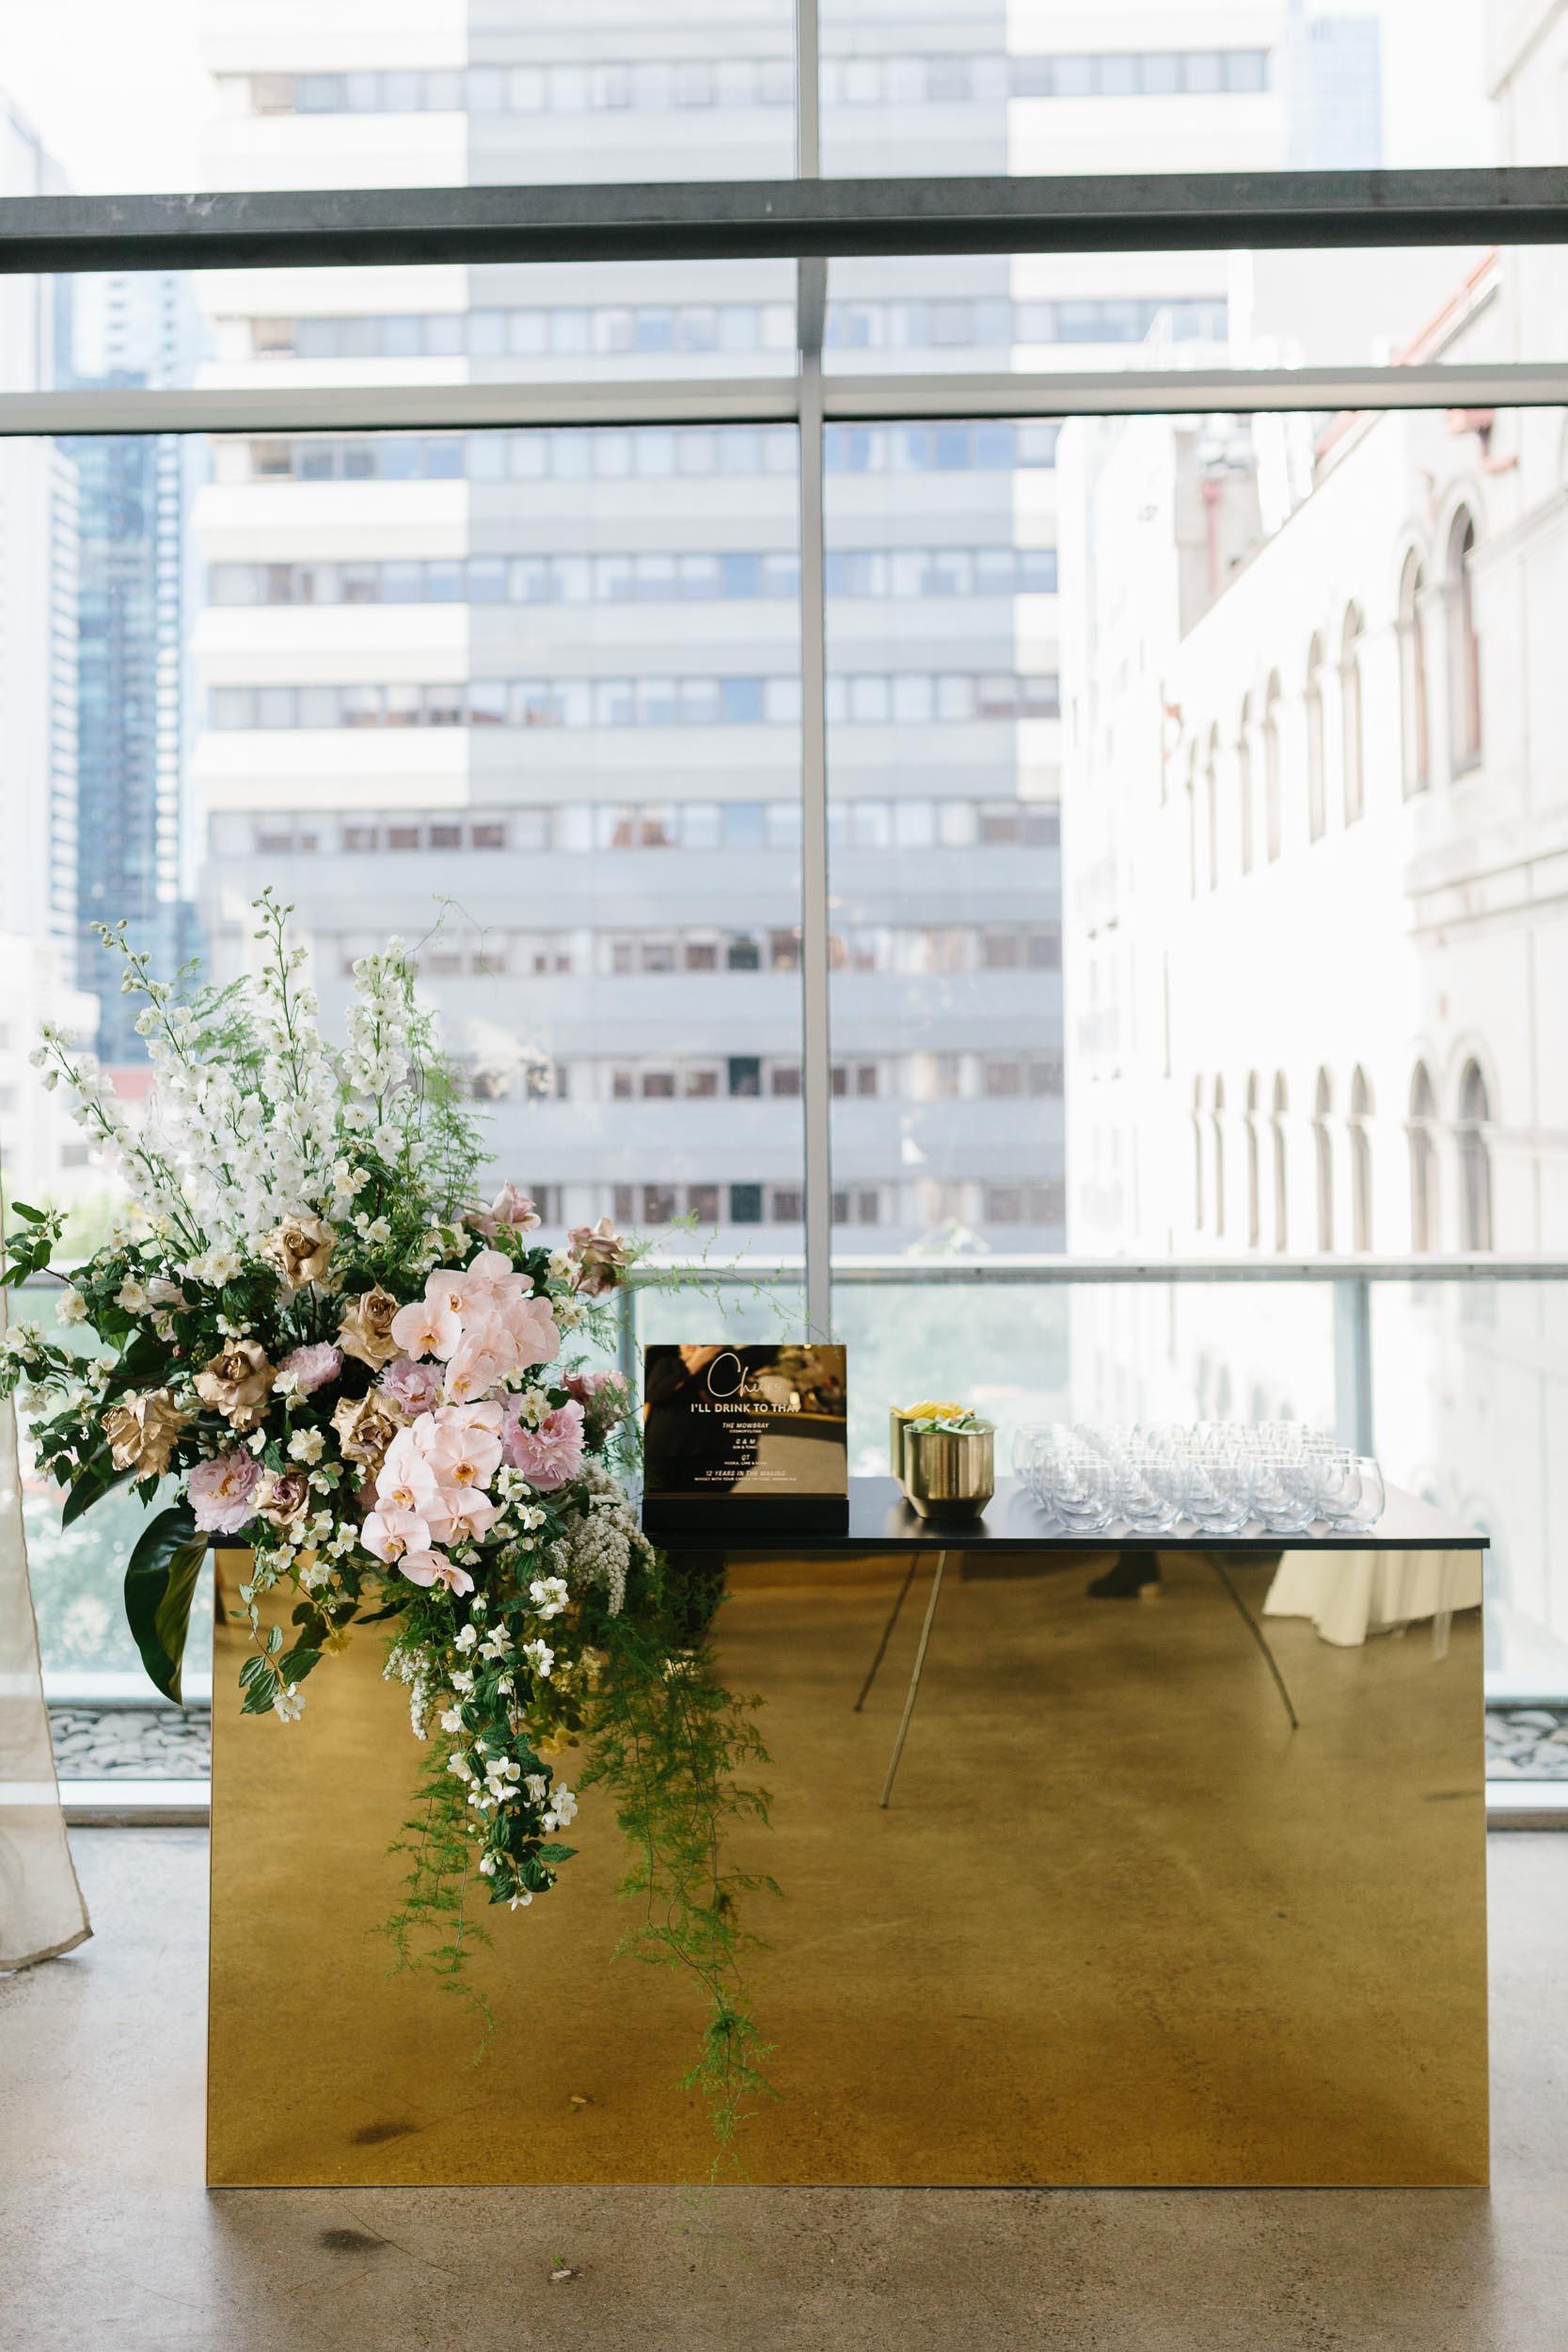 Kas-Richards-Wedding-Photographer-Melbourne-City-Wedding-Alto-Event-Space-Jane-Hill-Bridal-Gown-40.jpg